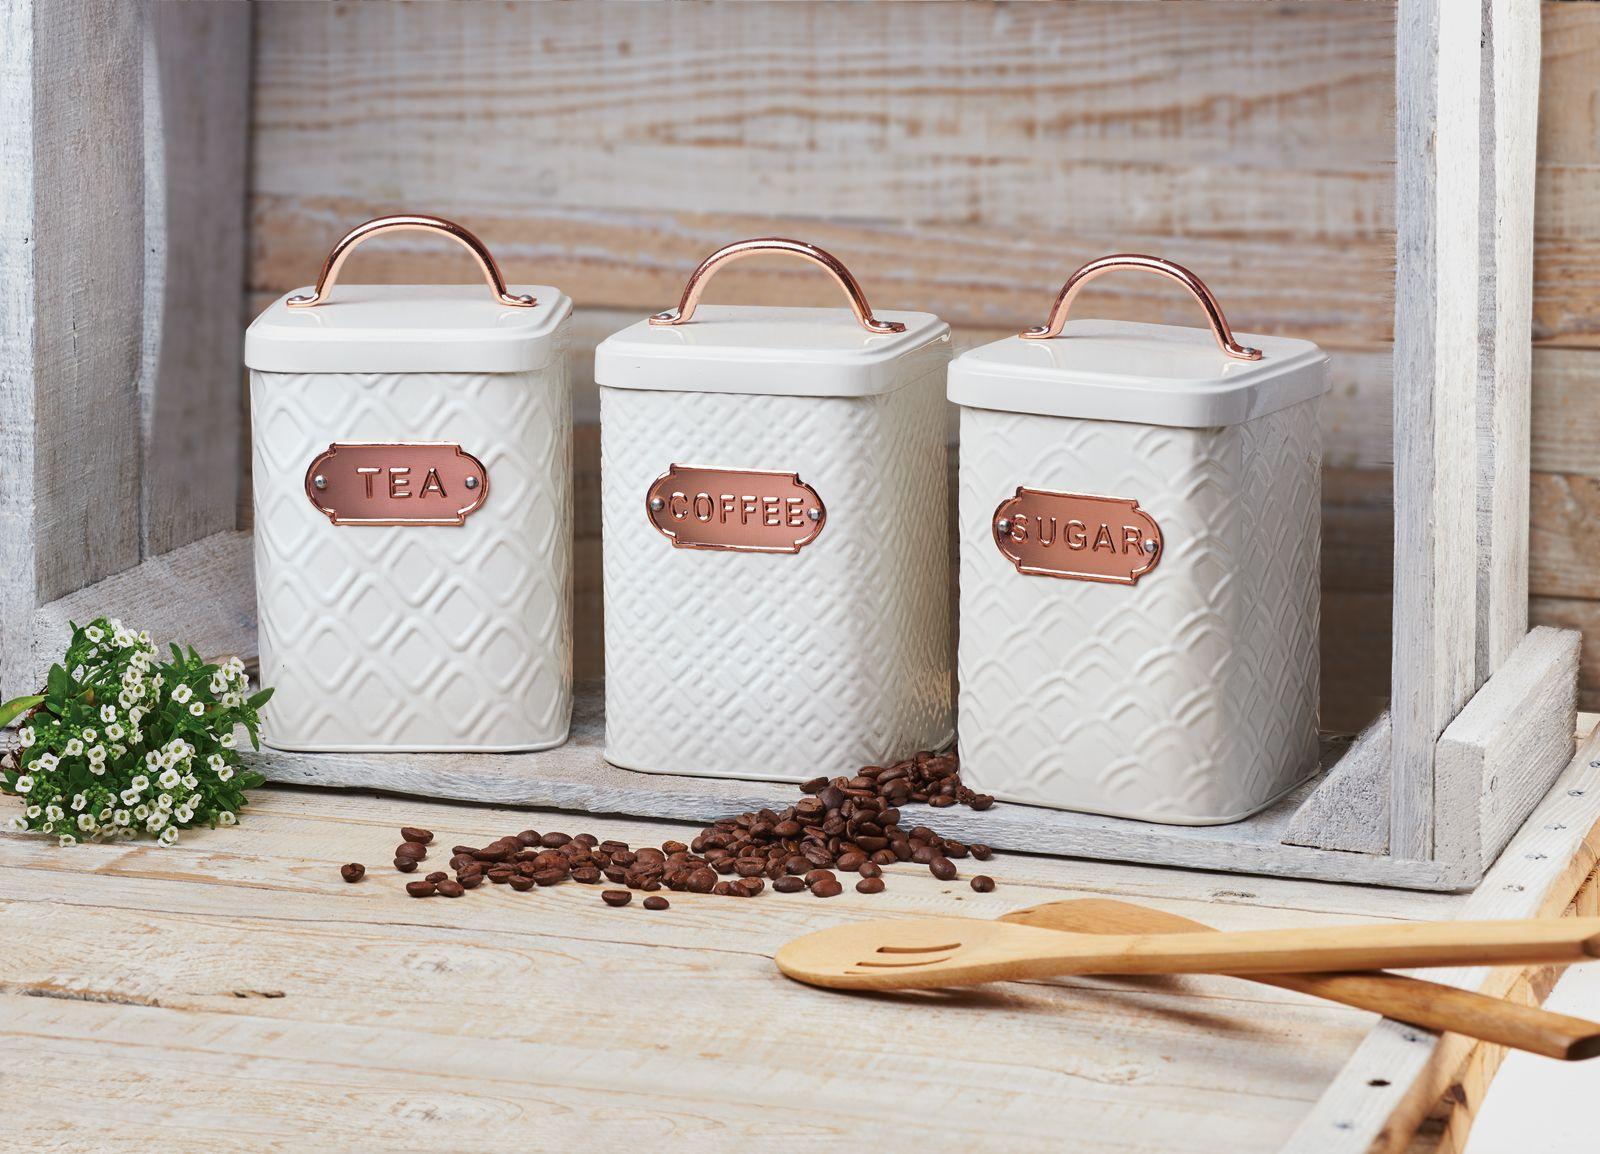 Ventana Collection Made In #India #coffee #tea #sugar #flour #kitchen